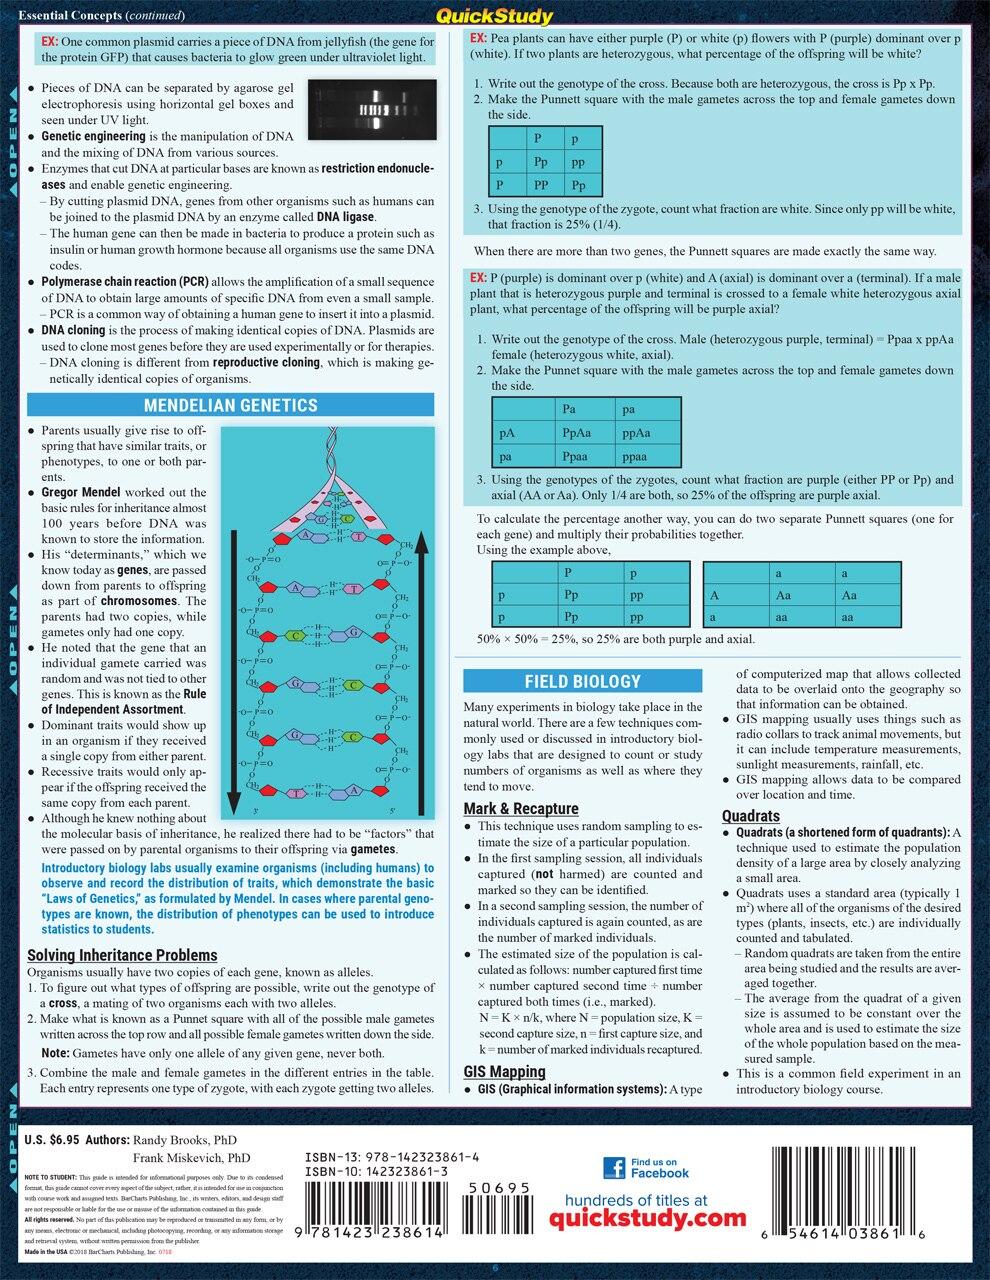 Quick Study QuickStudy Bio Lab Basics Laminated Study Guide BarCharts Publishing  Life Science Reference Back Image